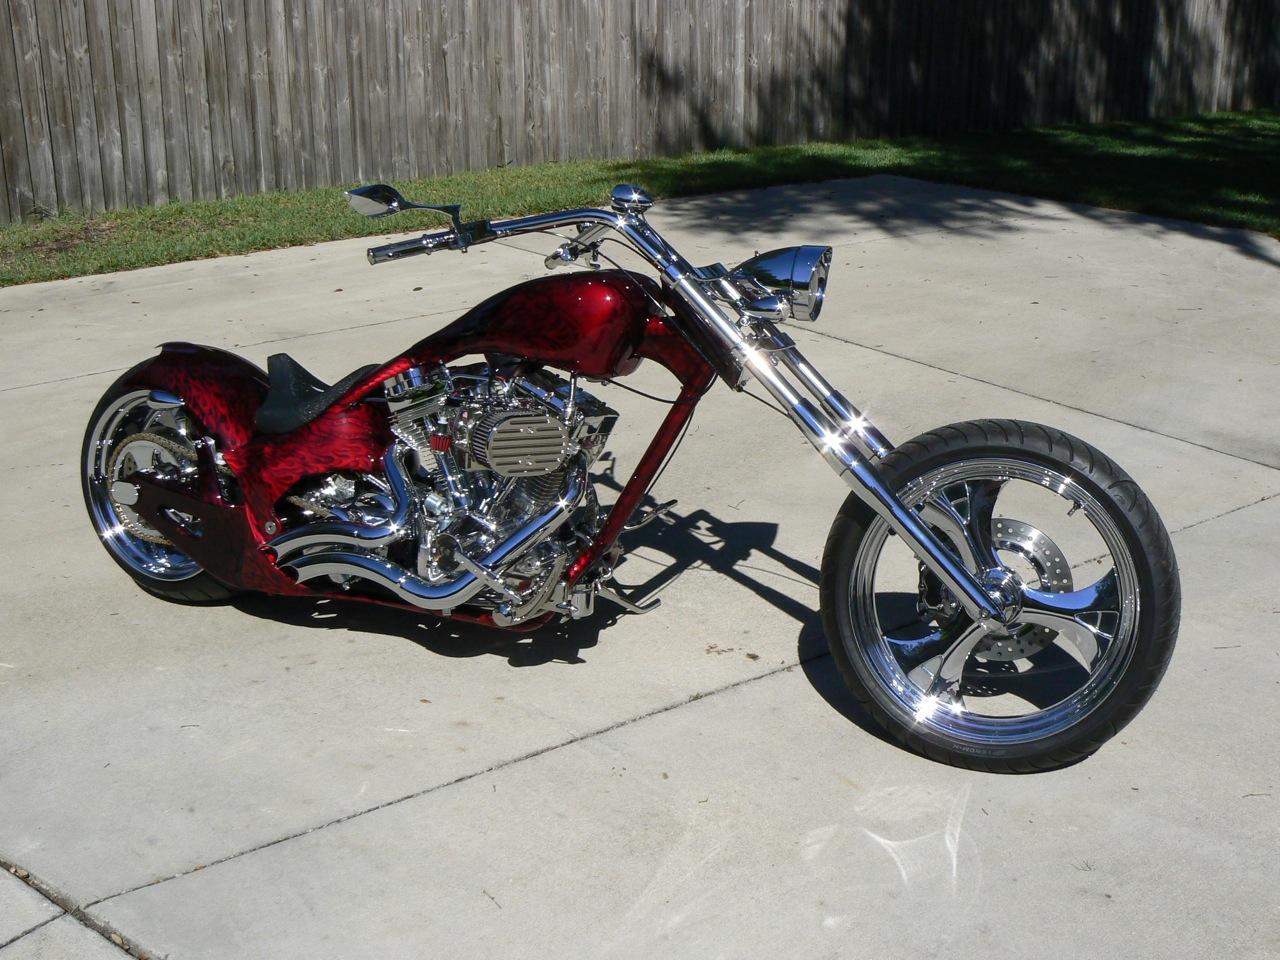 harley davidson motorcycle custom motorcycle fan. Black Bedroom Furniture Sets. Home Design Ideas